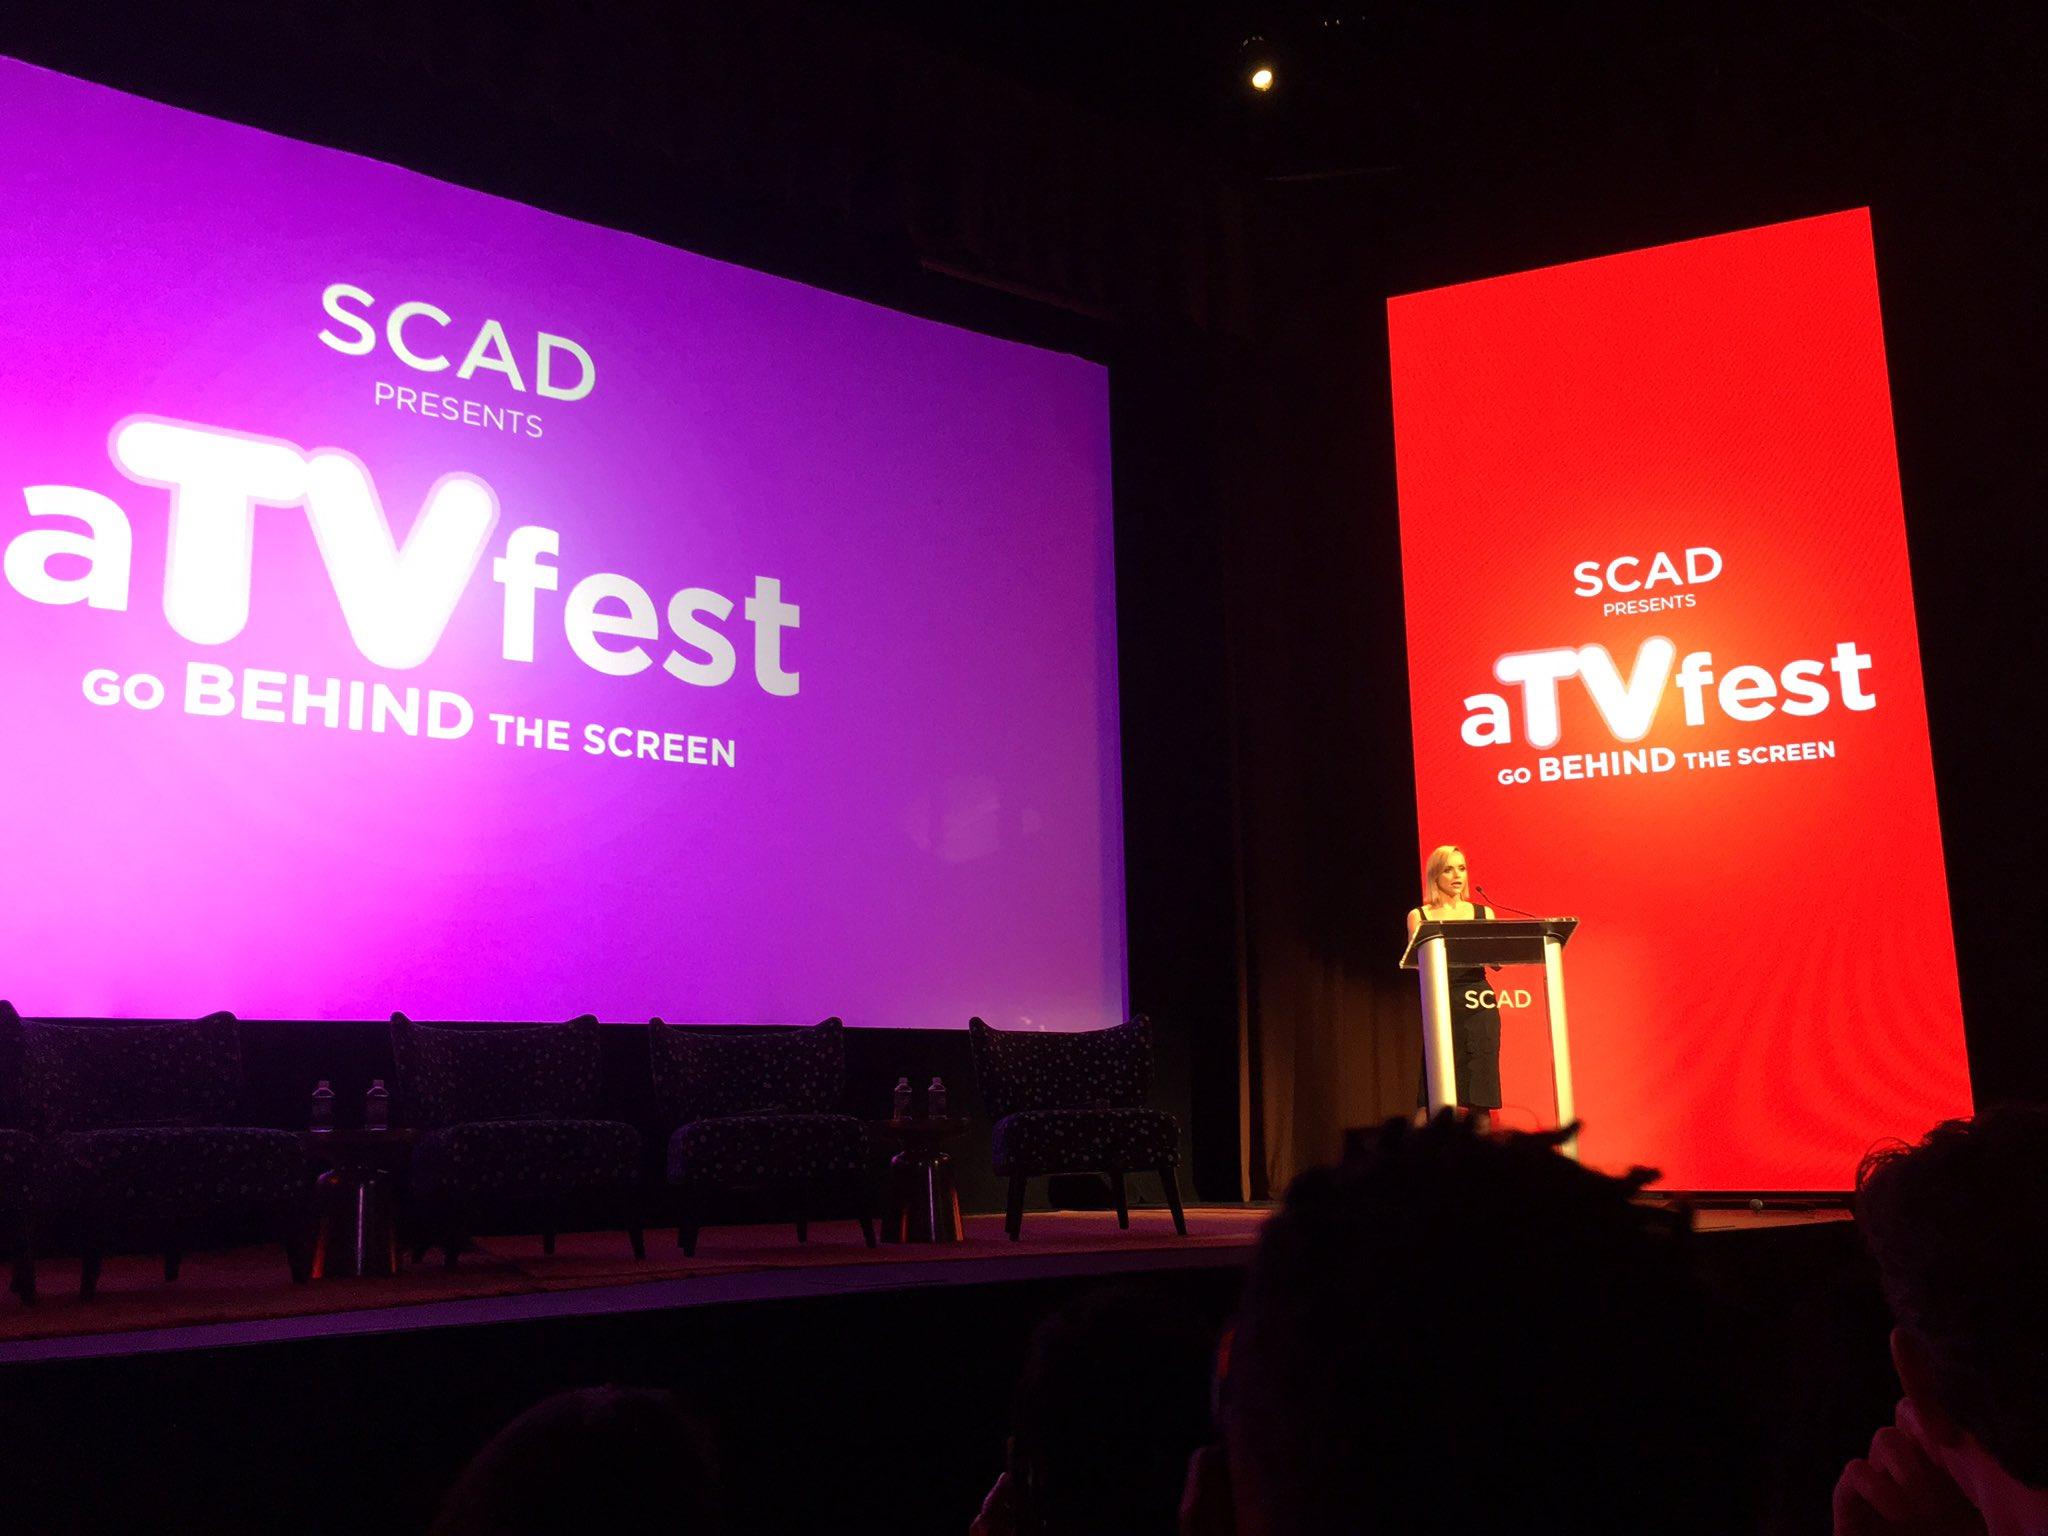 Congratulations to #aTVfest Vanguard award winner @ChristinaRicci! https://t.co/4rZr1rTVLR